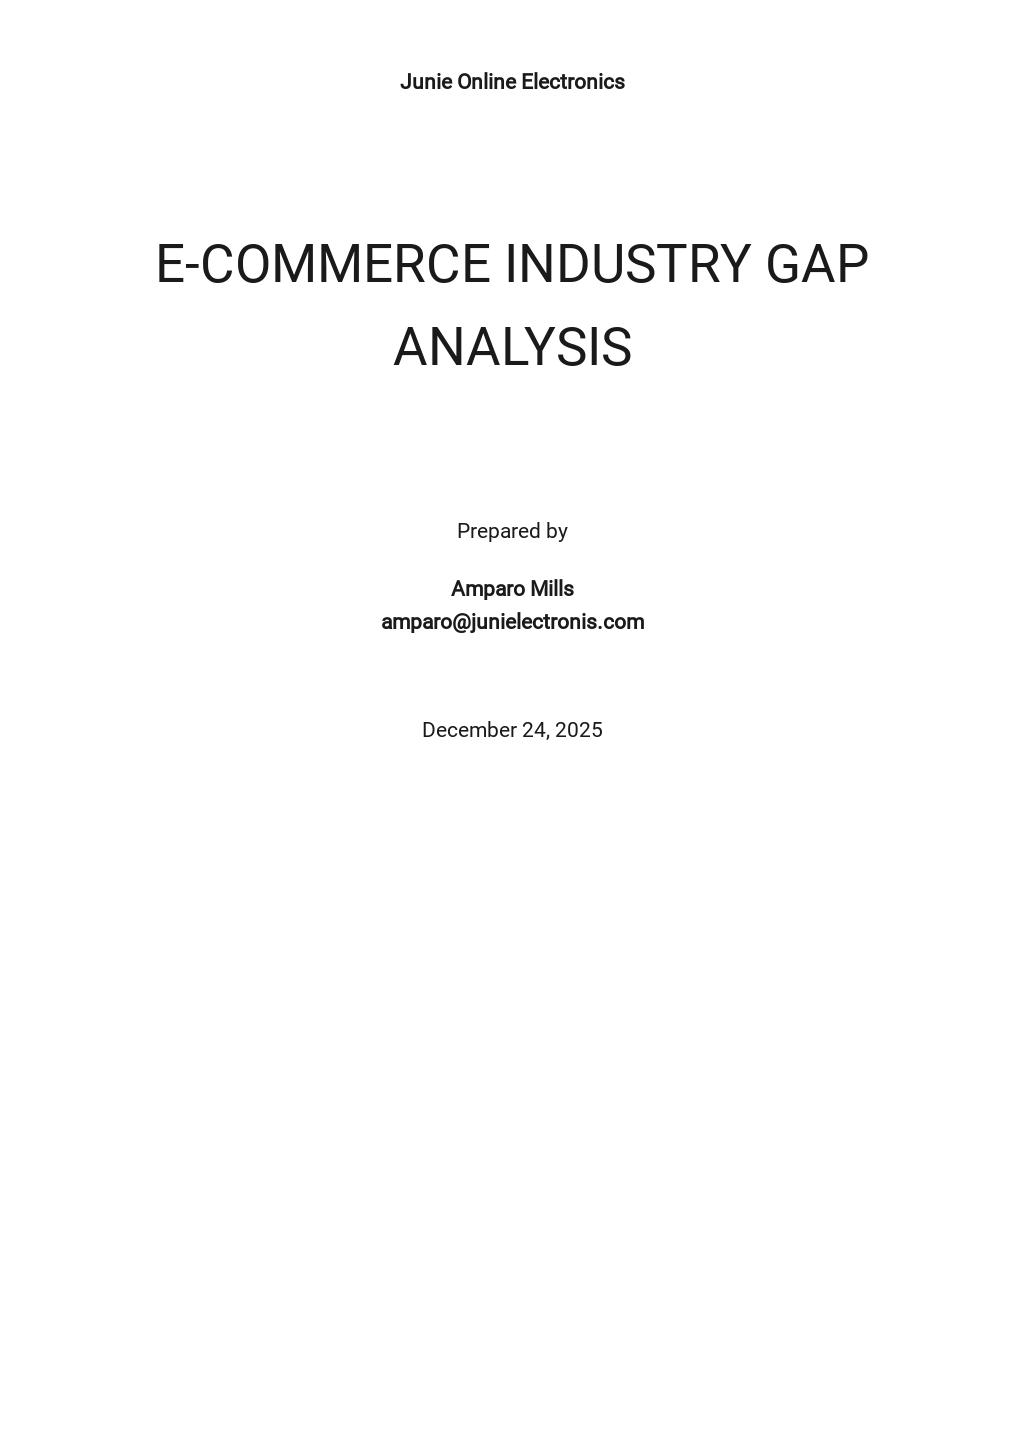 Industry Gap Analysis Template.jpe